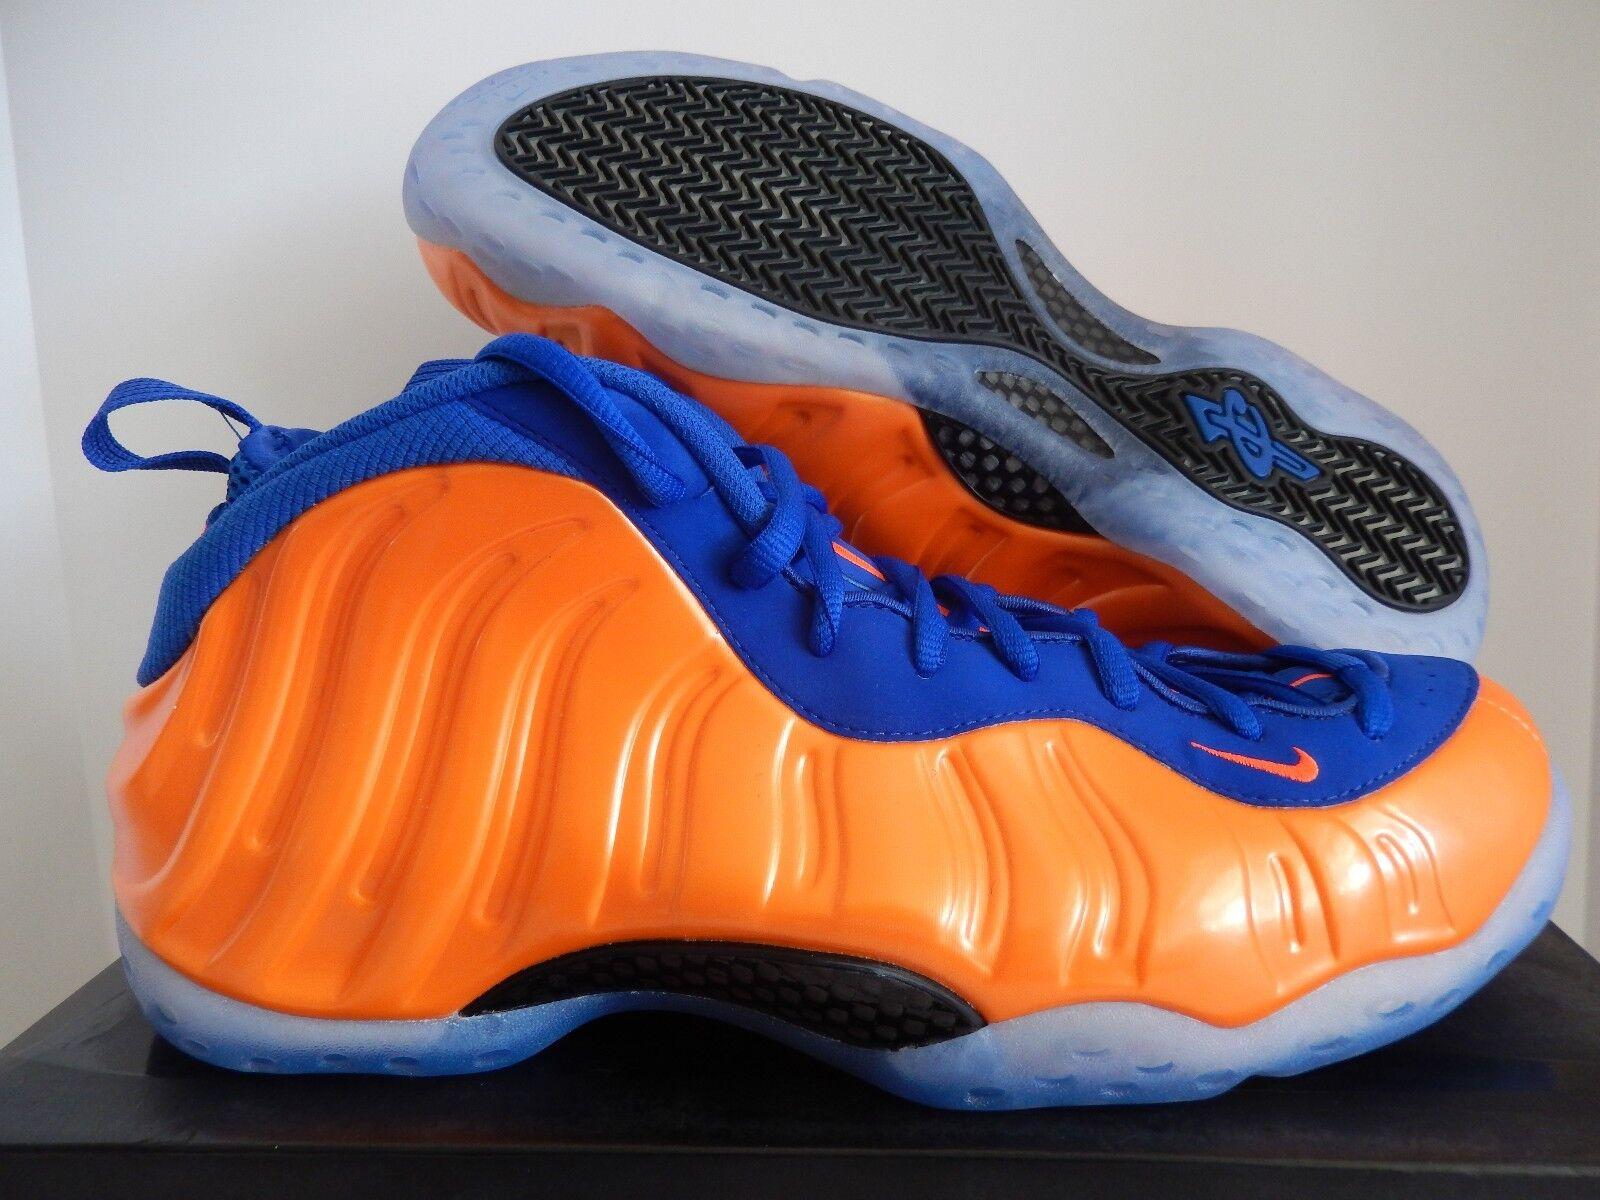 Nike Air Foamposite One 3201896801 total Crimson NaranjaAzul Knicks [ 3201896801 One ] 7f07b6